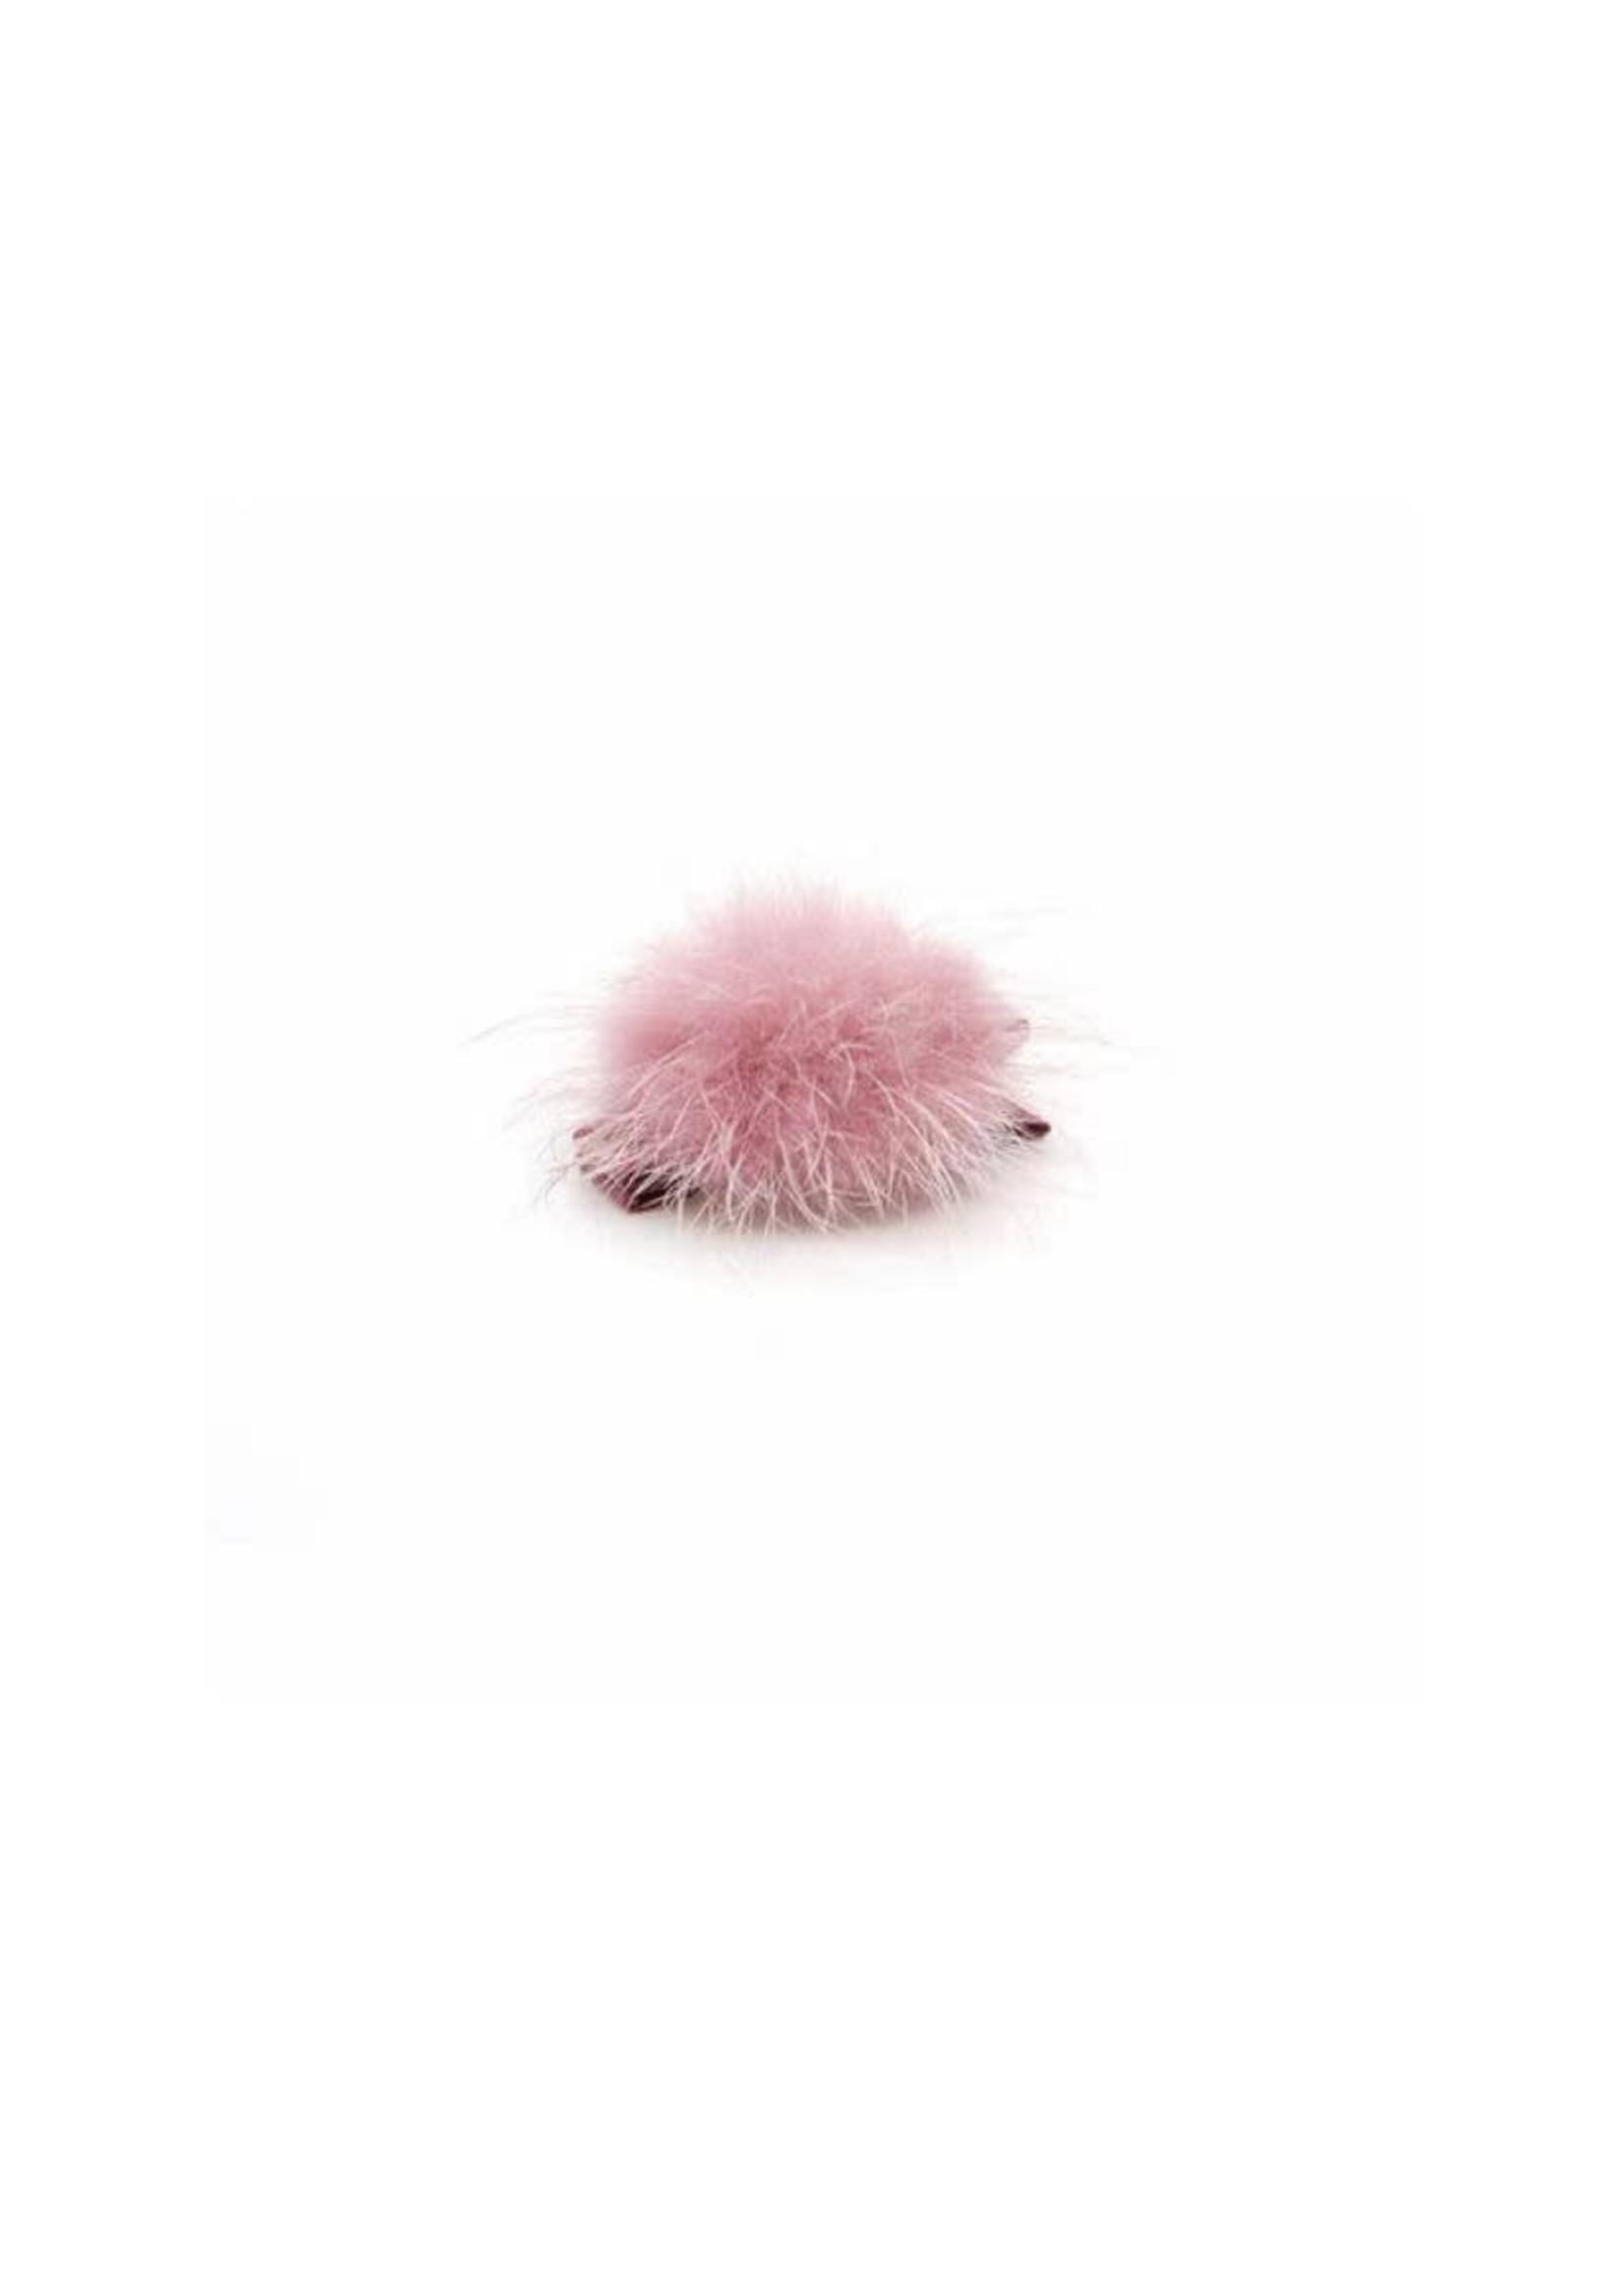 olilia Olilia Small Mink Puff Hair Clip - Sweet Nectar